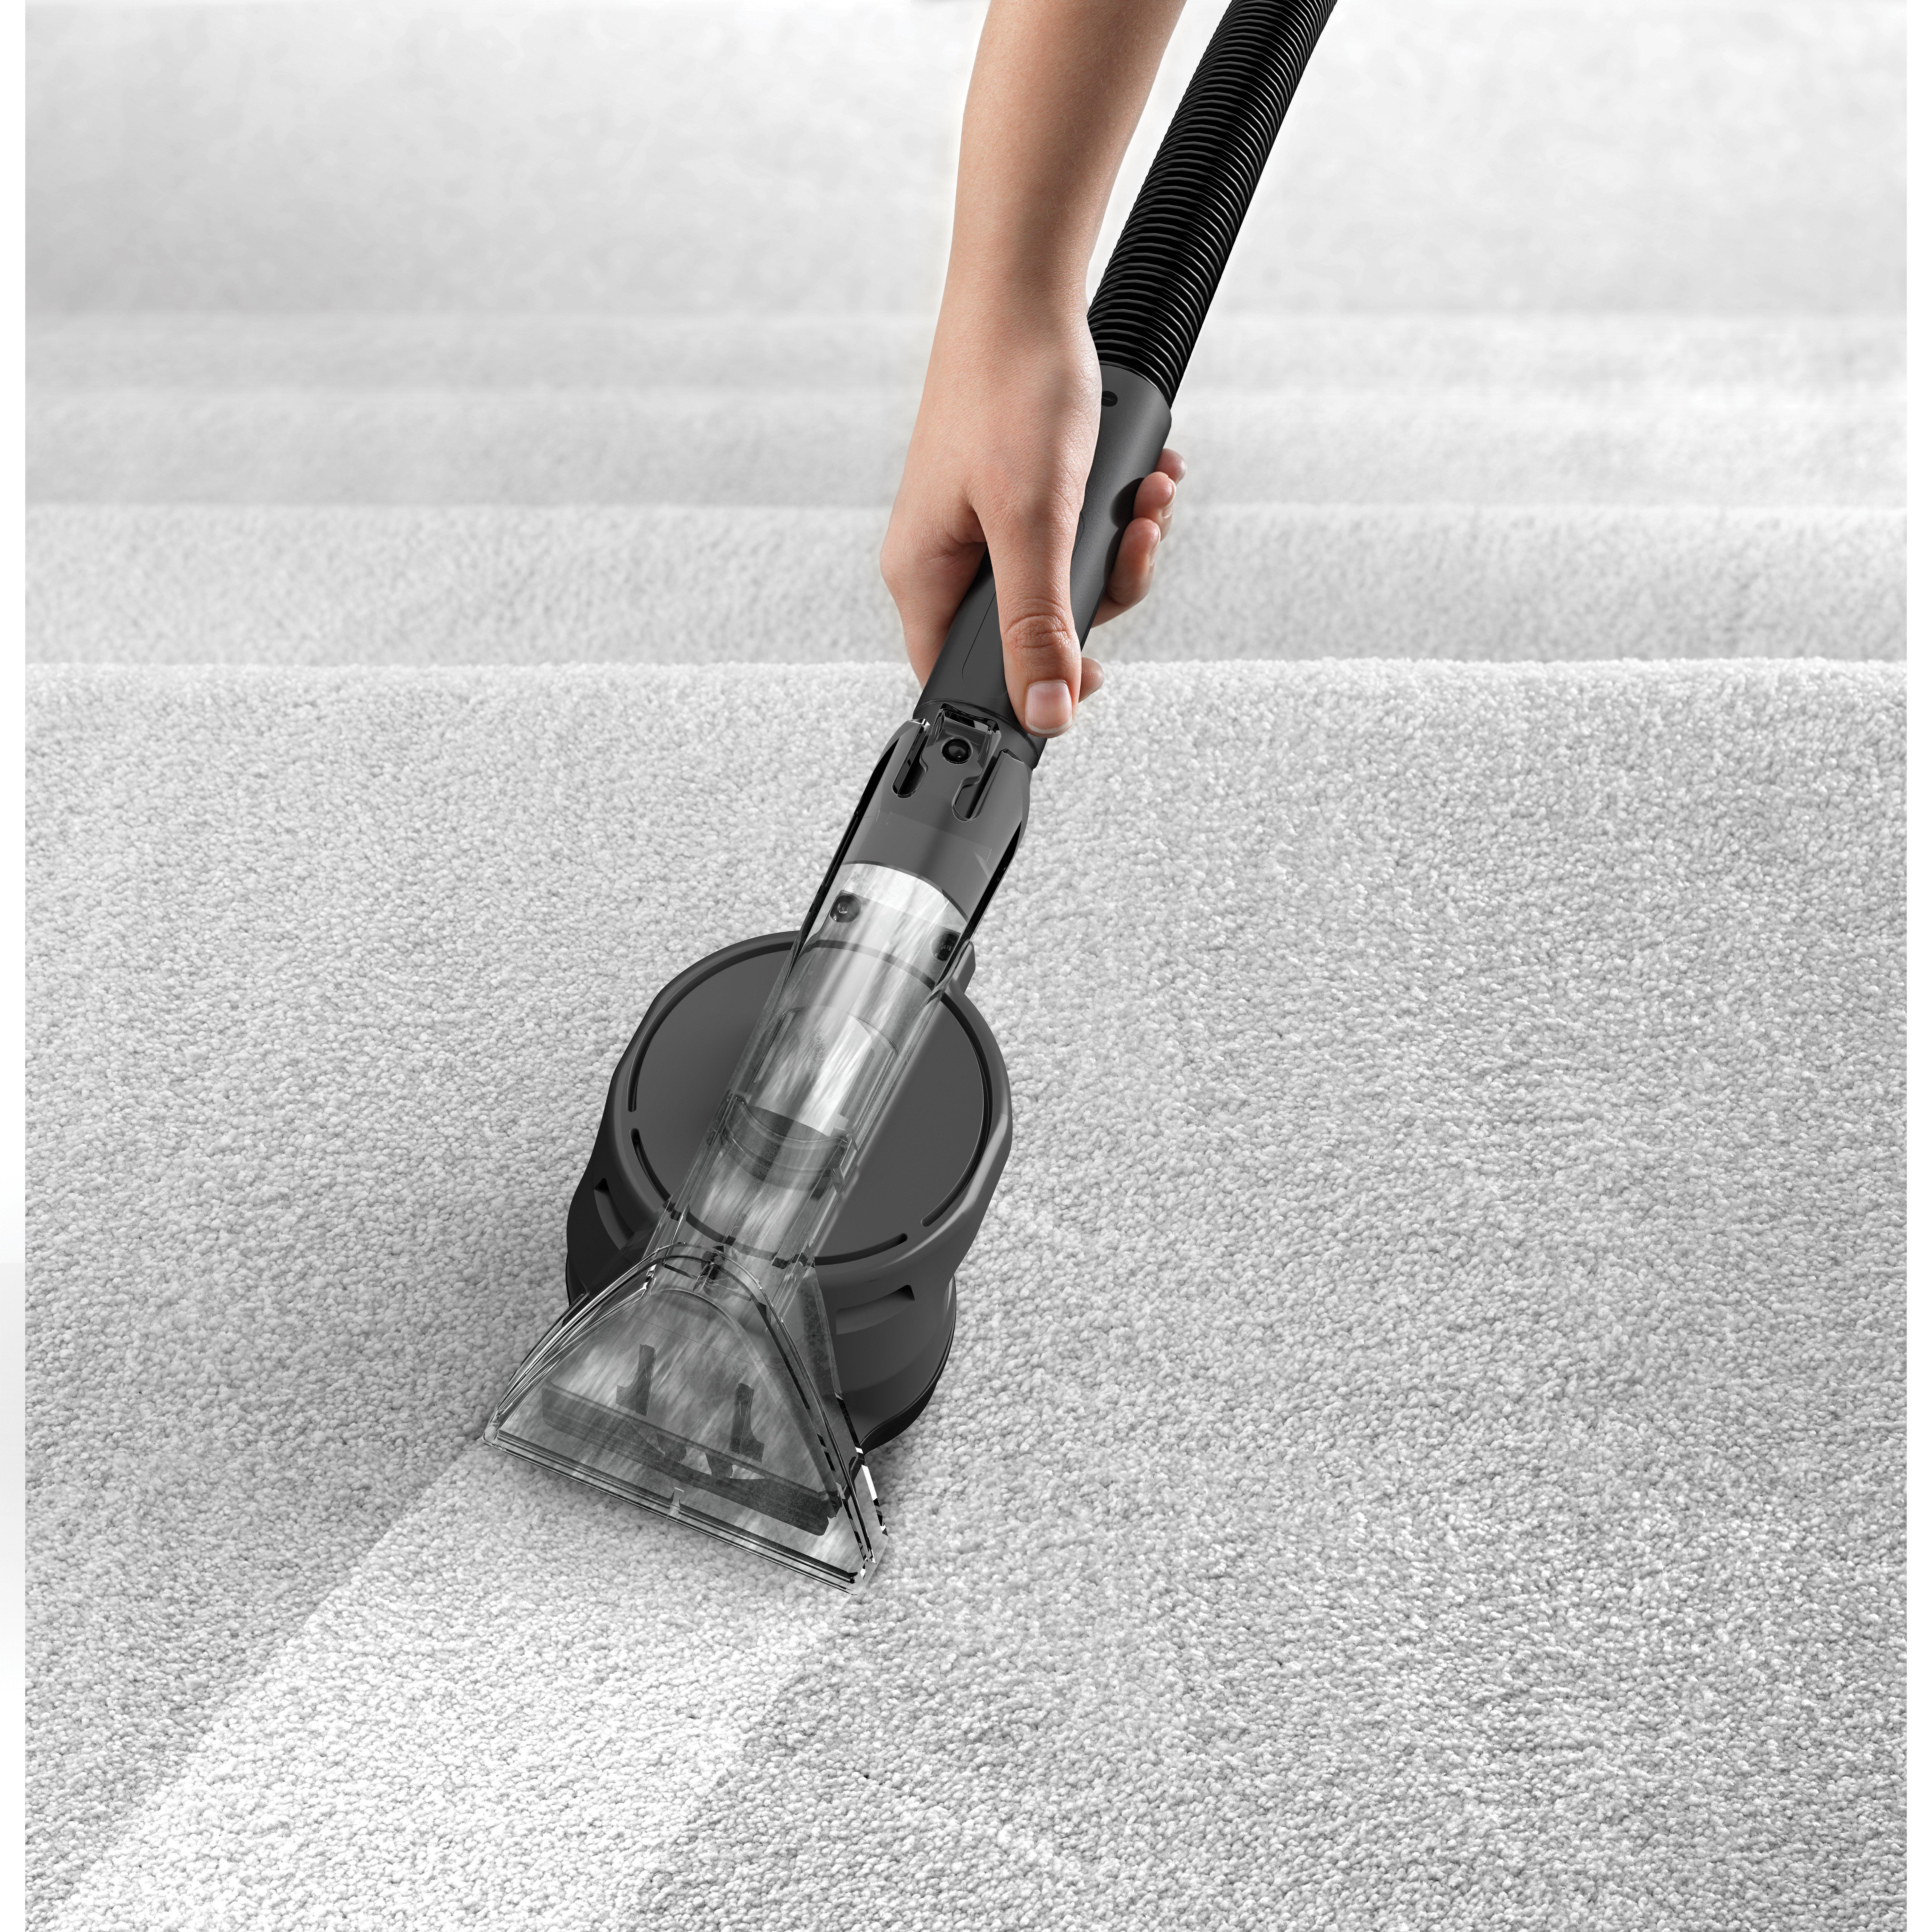 Dual Power Pro Carpet Cleaner7